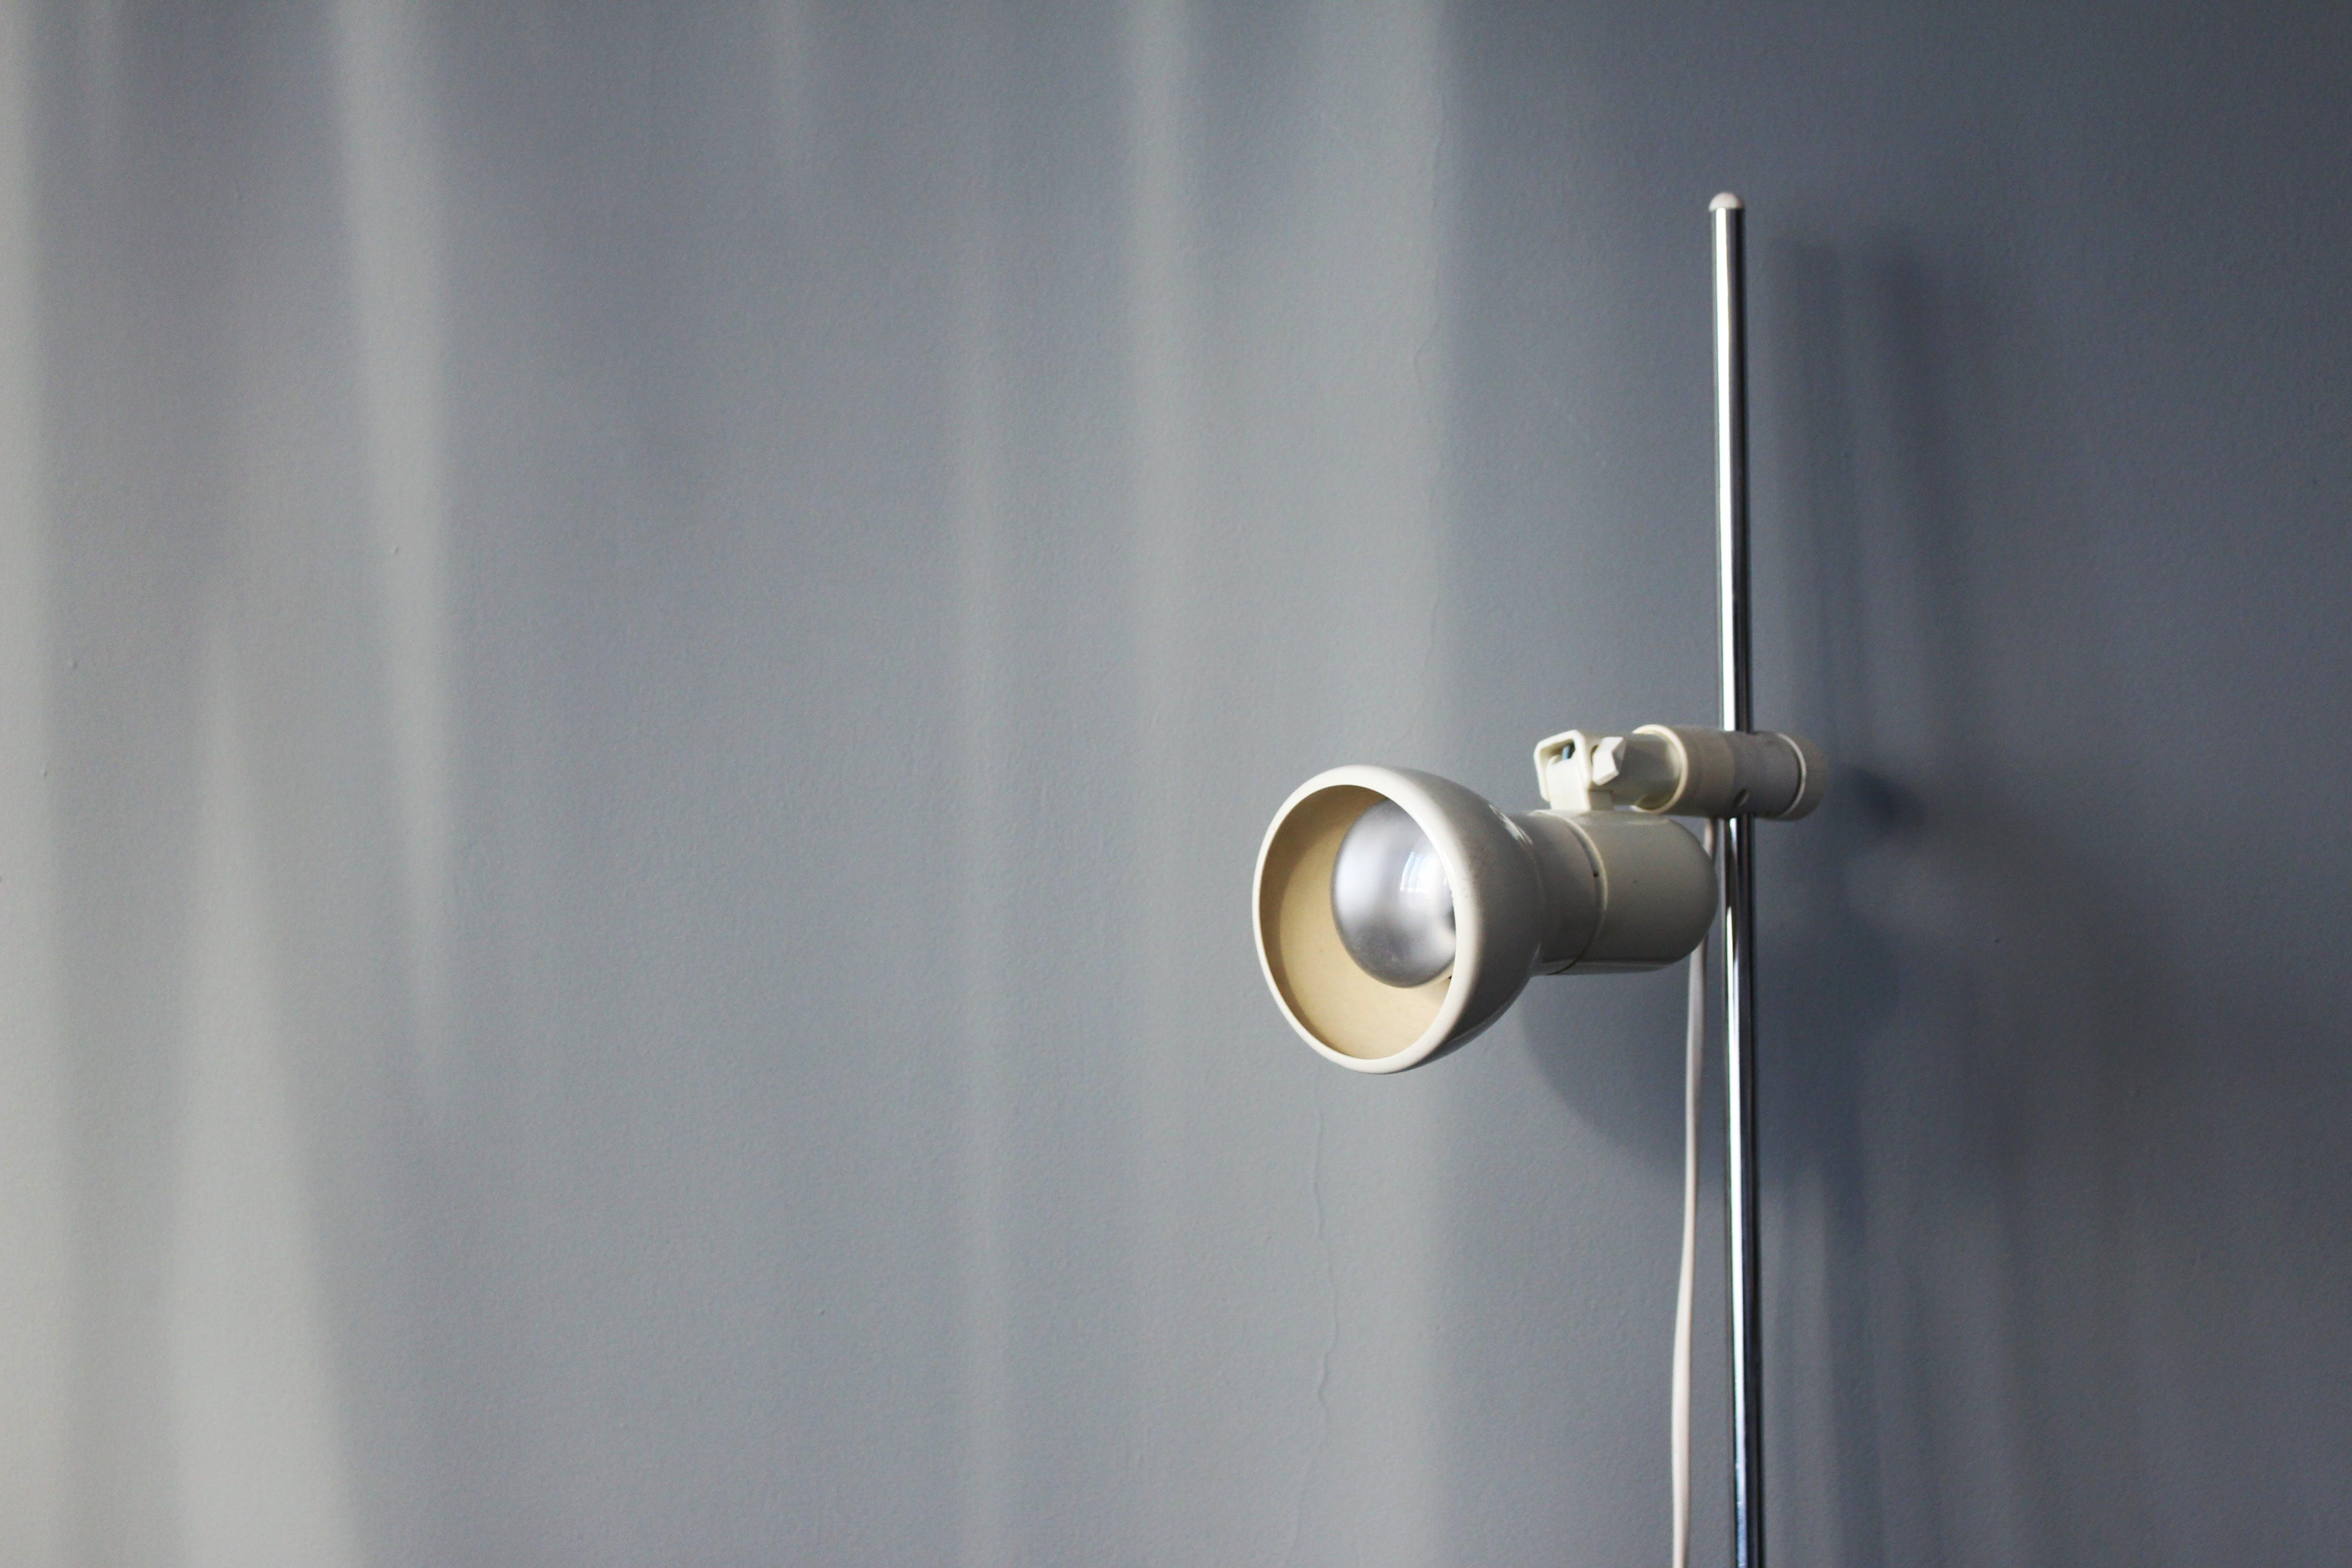 Free stock photo of light, lamp, bulb, shadow